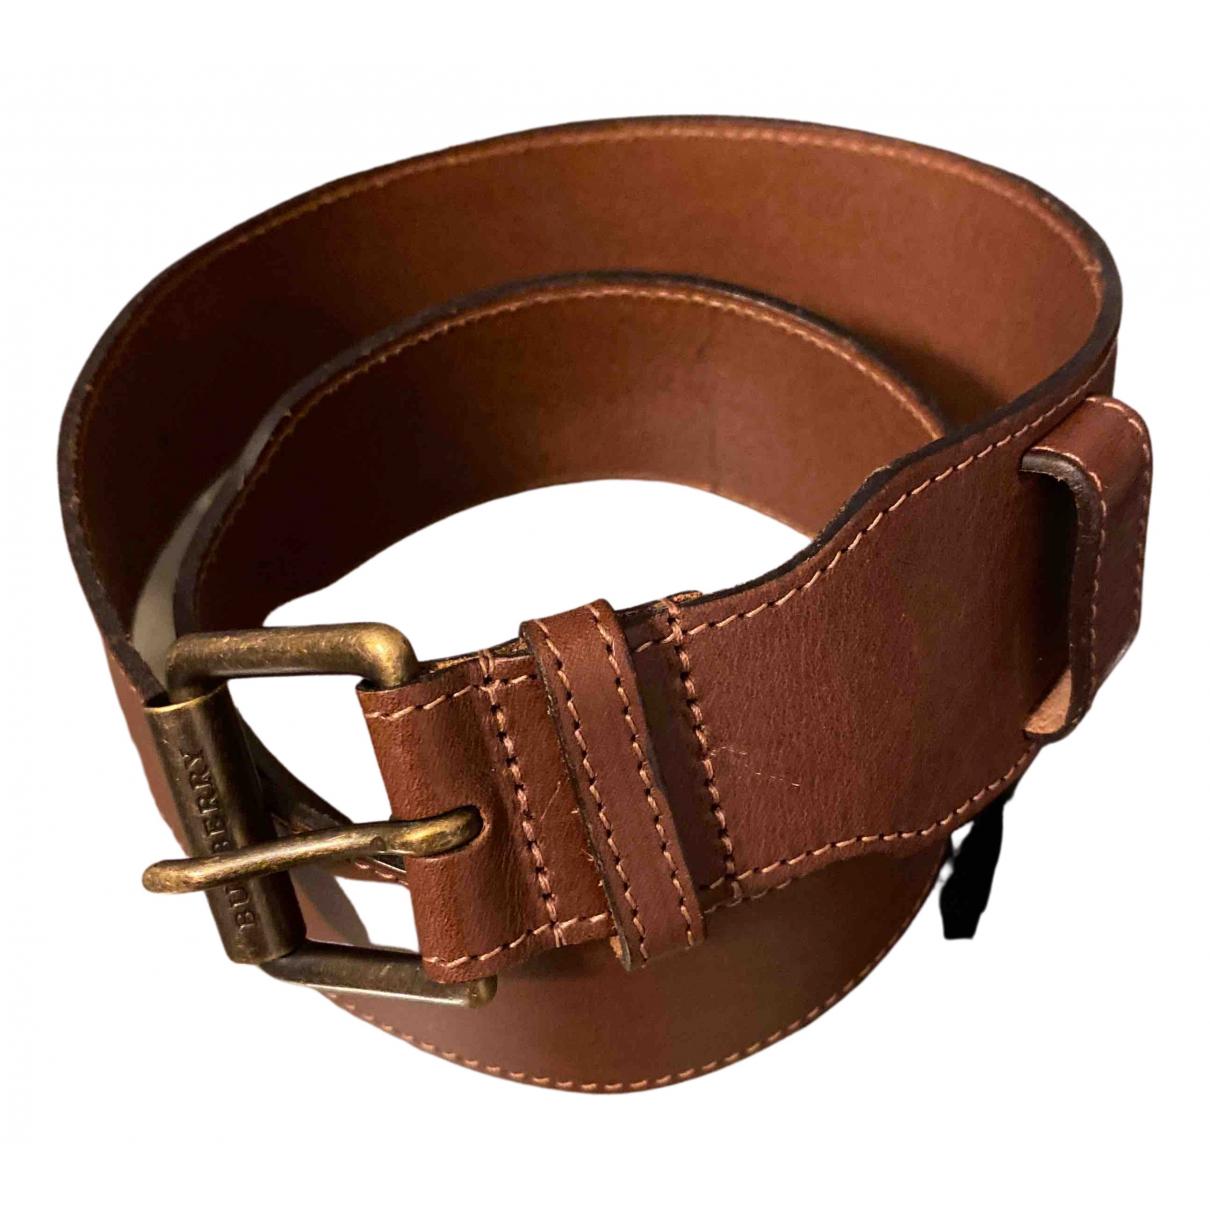 Burberry N Brown Pearls belt for Women 85 cm